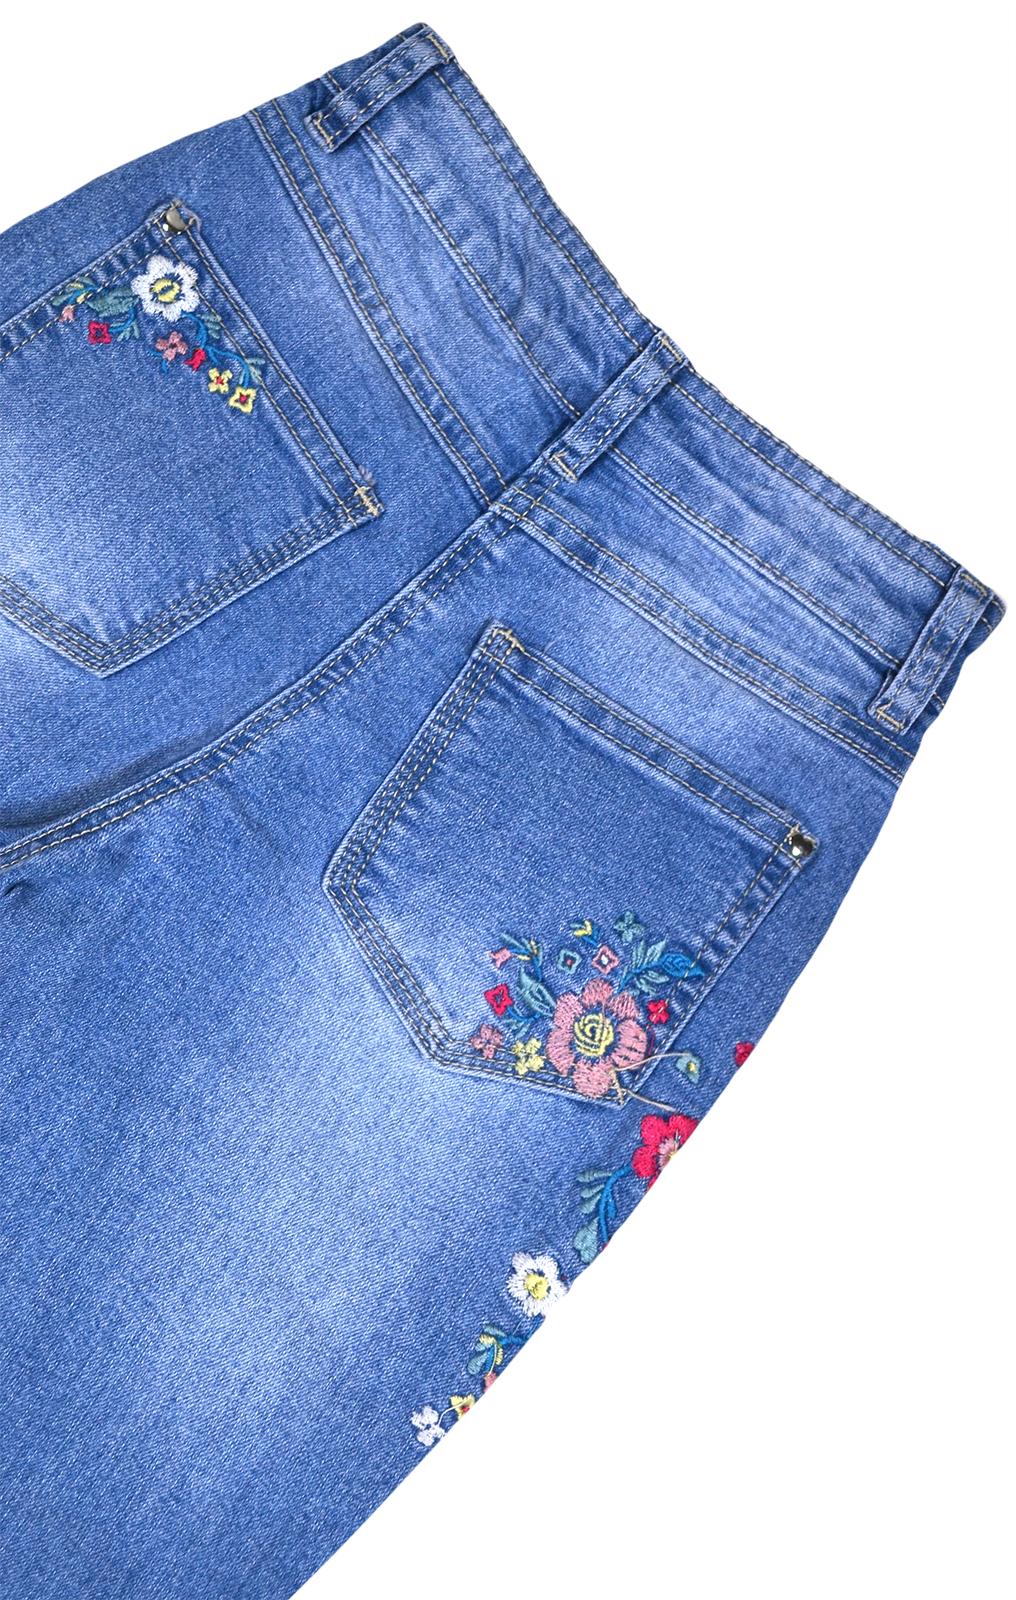 Girls-Floral-Denim-Jeans-Enfants-Neuf-Pantalon-Bleu-Age-4-5-6-7-8-9-10-11-12-13-14-ans